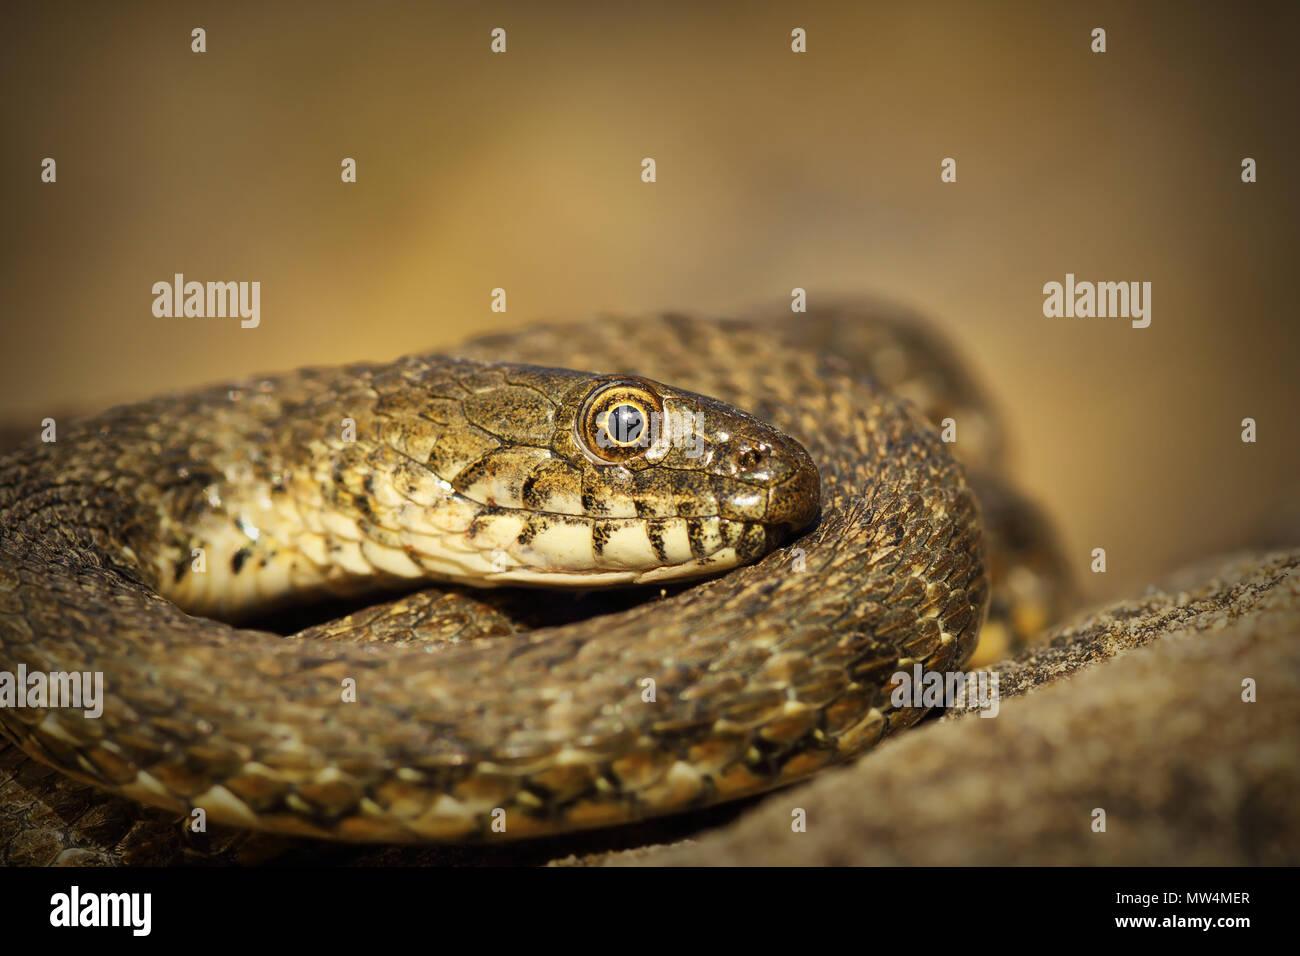 close up of dice snake ( Natrix tessellata ) - Stock Image